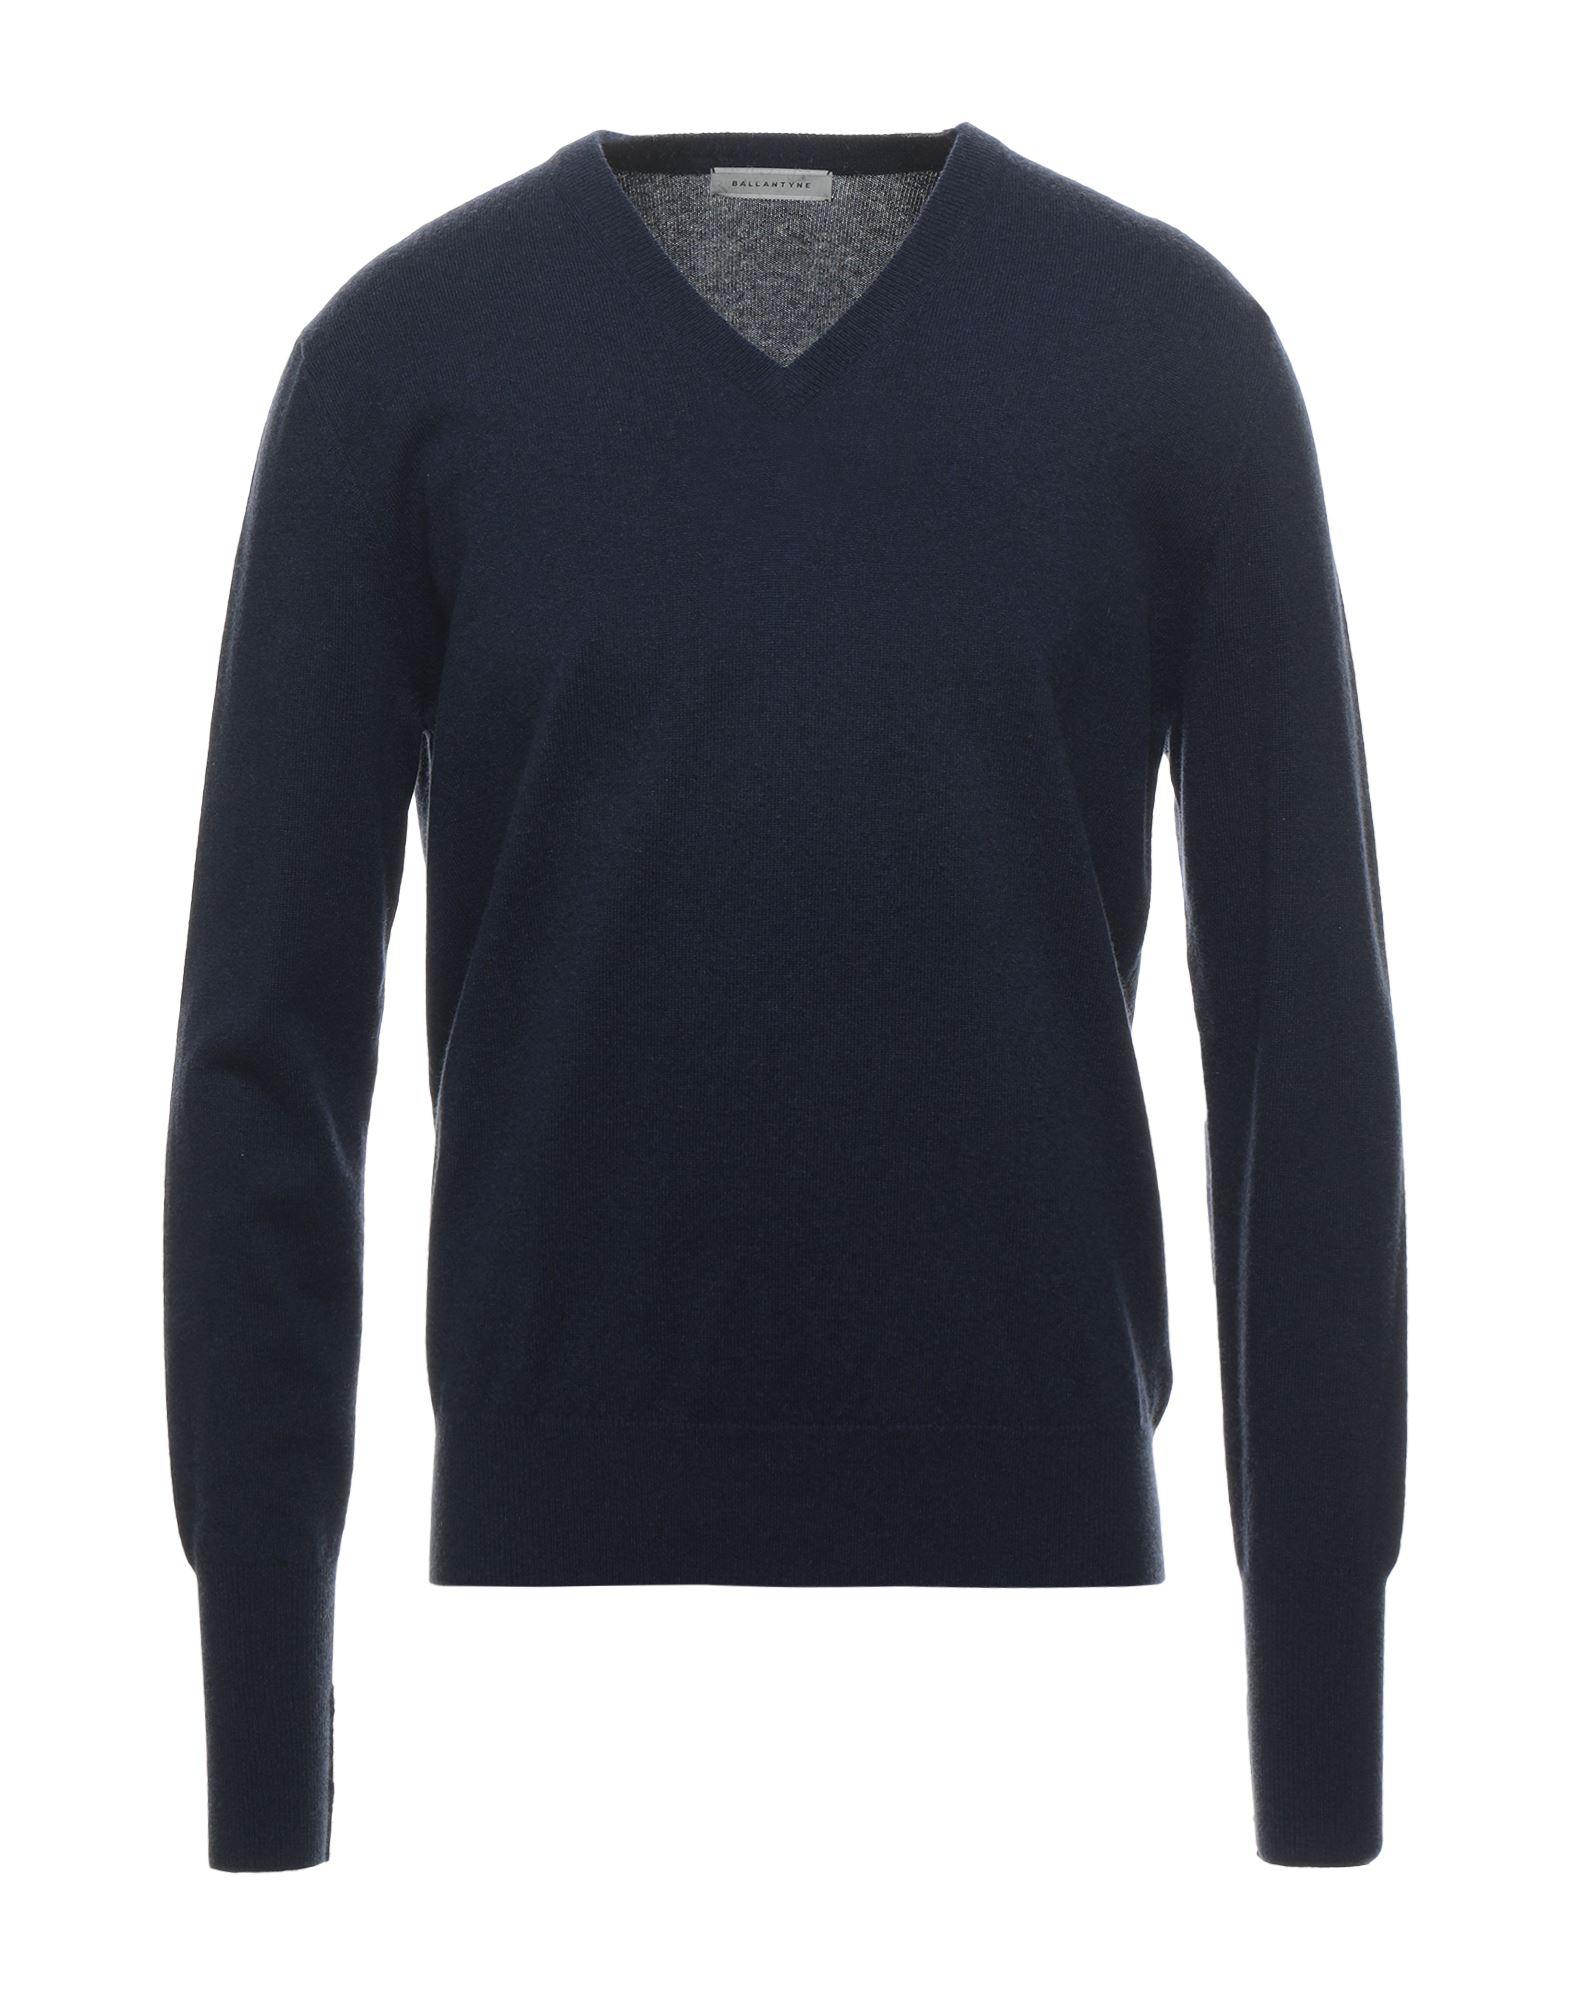 BALLANTYNE Sweaters - Item 39443568